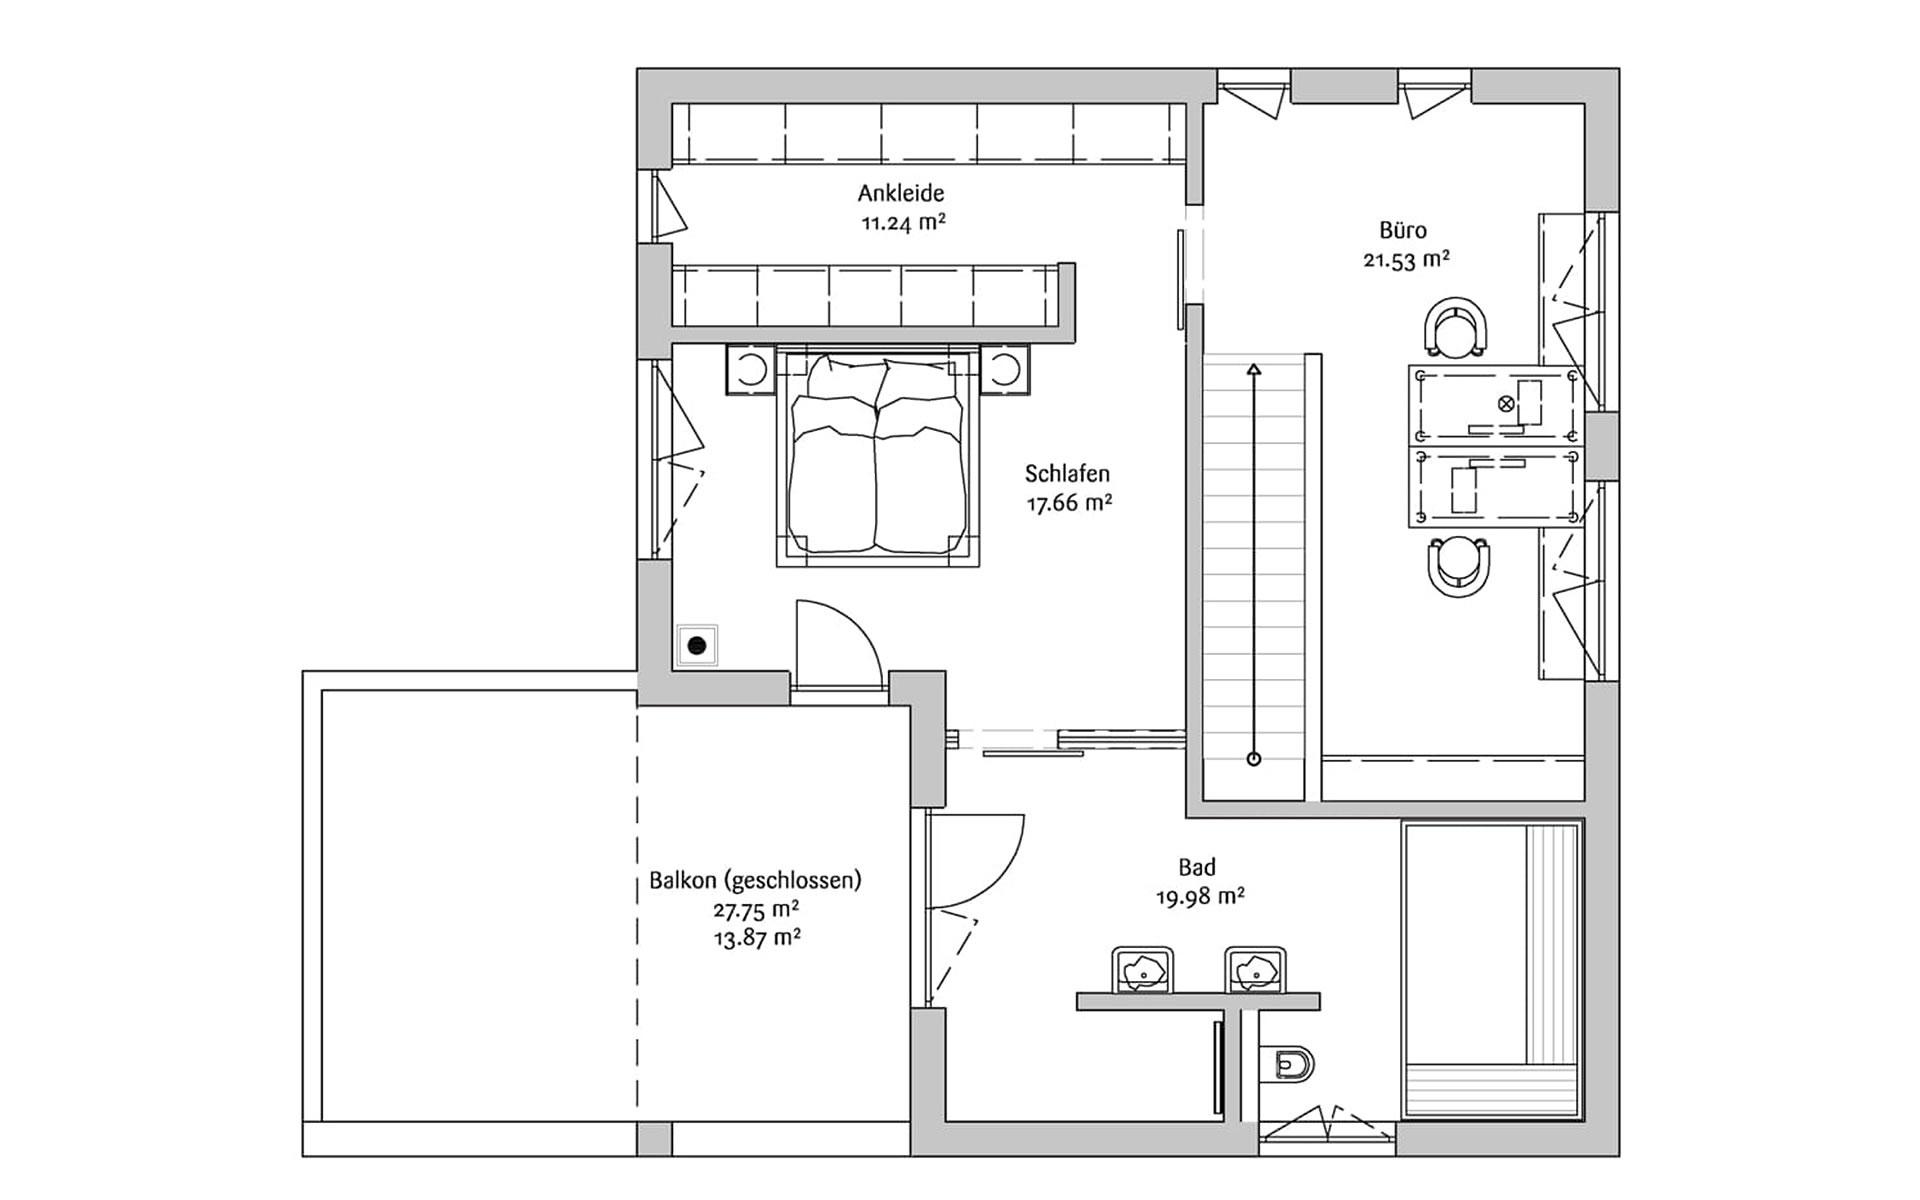 Obergeschoss Bauhaus 190 von FischerHaus GmbH & Co. KG